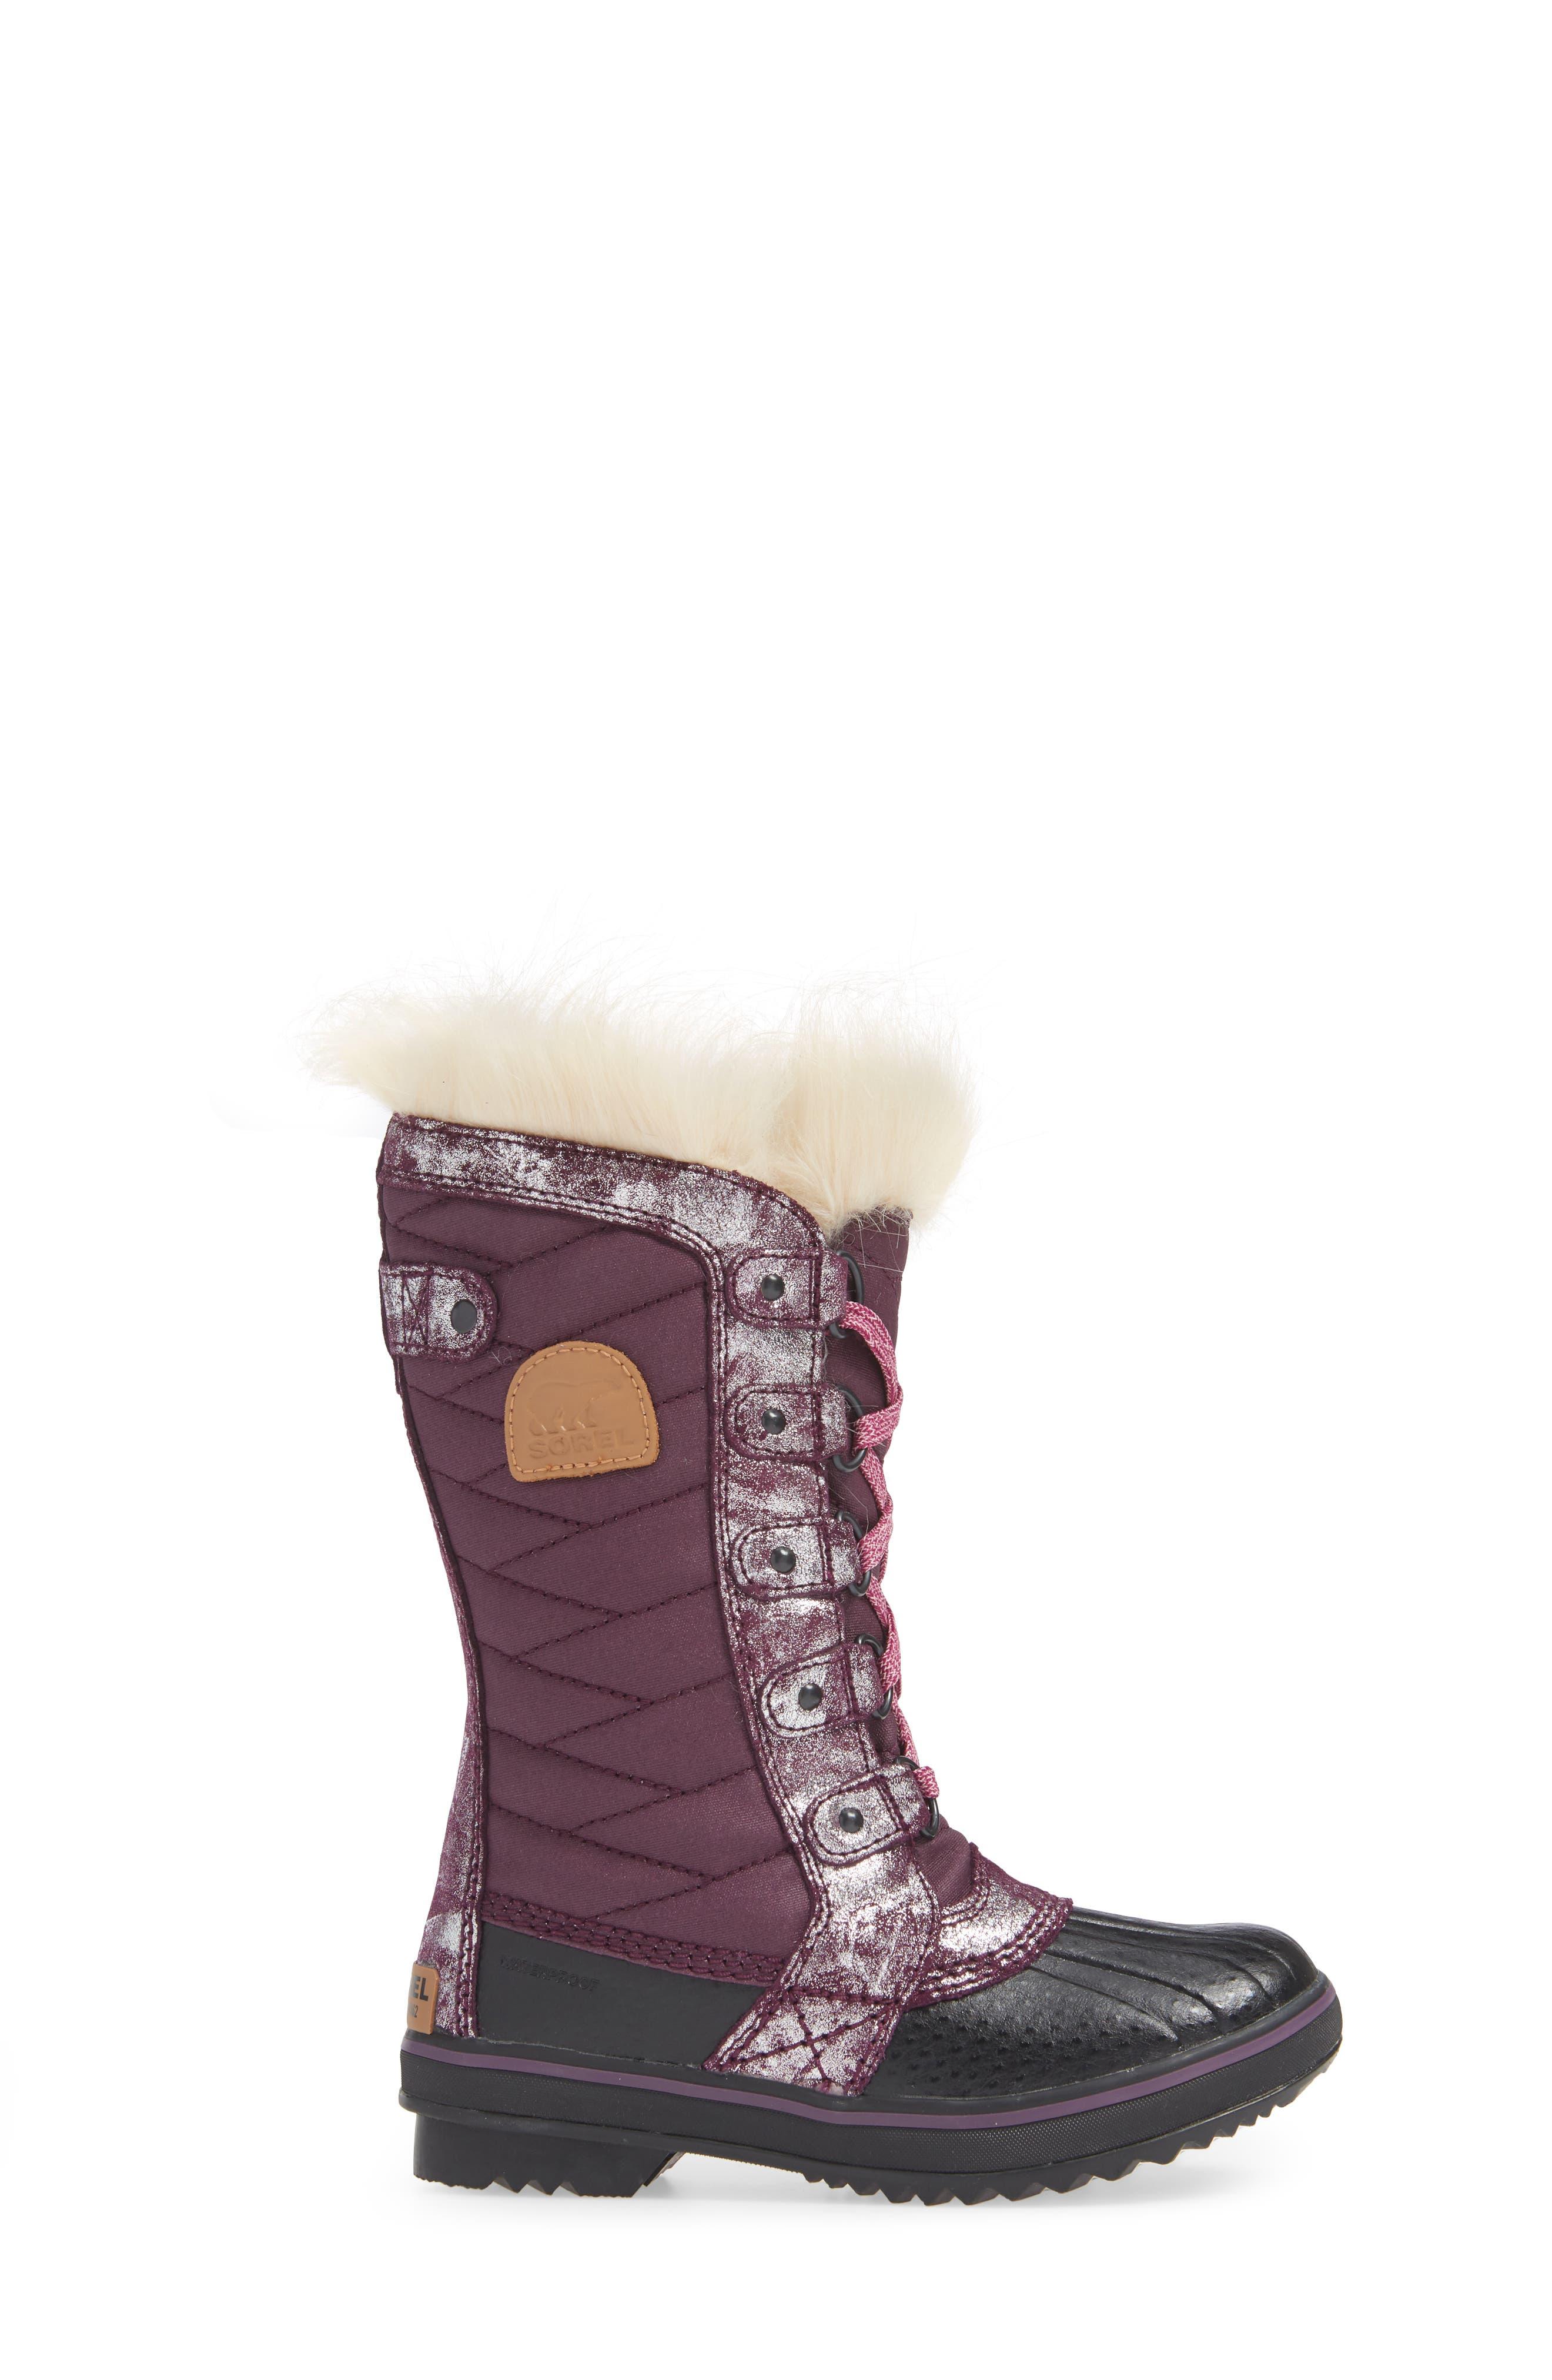 Tofino II Faux Fur Lined Waterproof Boot,                             Alternate thumbnail 3, color,                             562